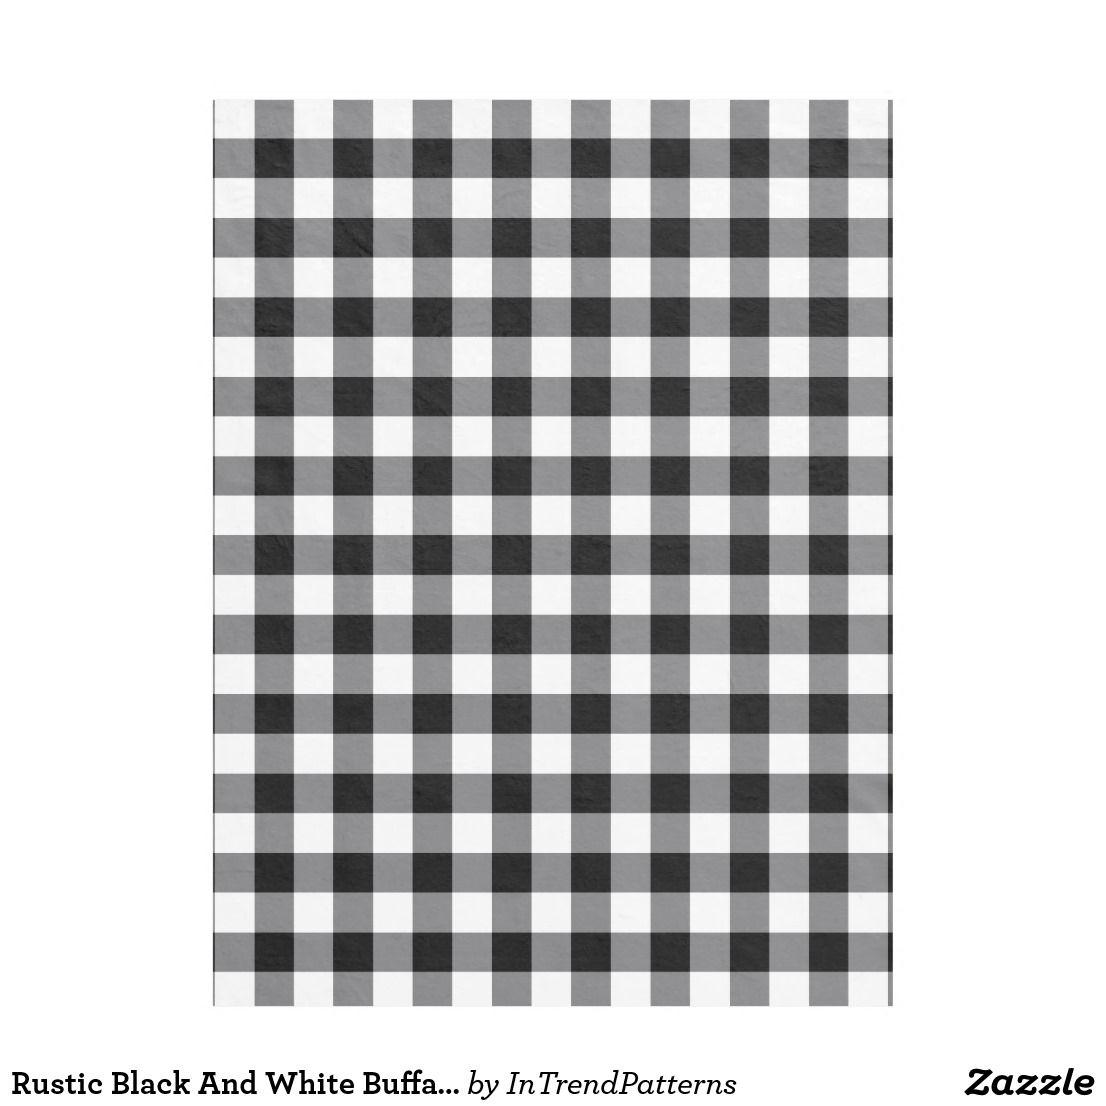 Rustic Black And White Buffalo Plaid Fleece Blanket Zazzle Com Buffalo Plaid Black White Rustic